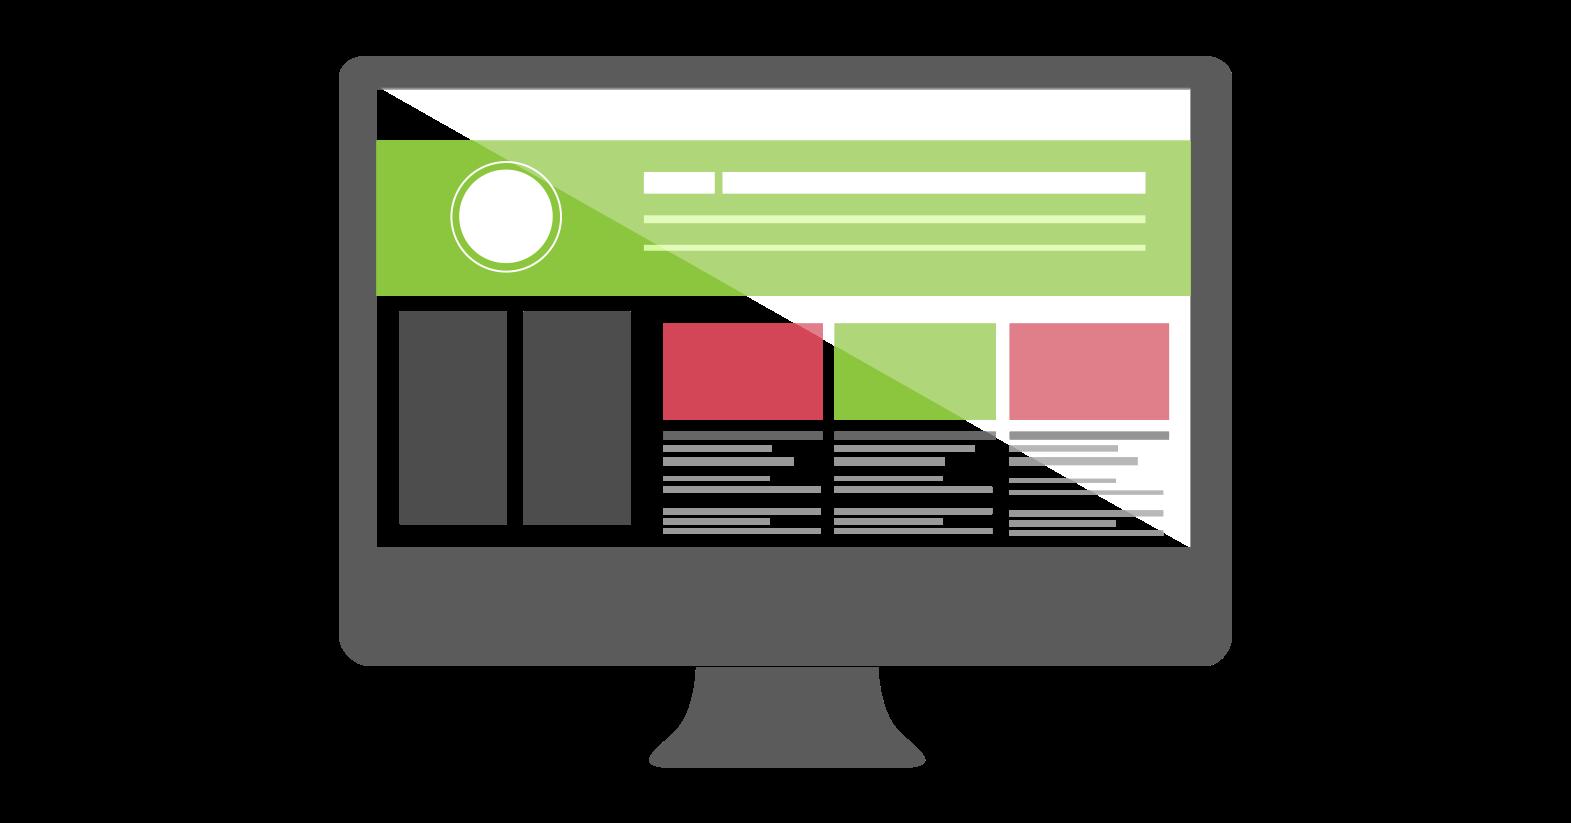 responsive website design and development company, Mobile Web Development